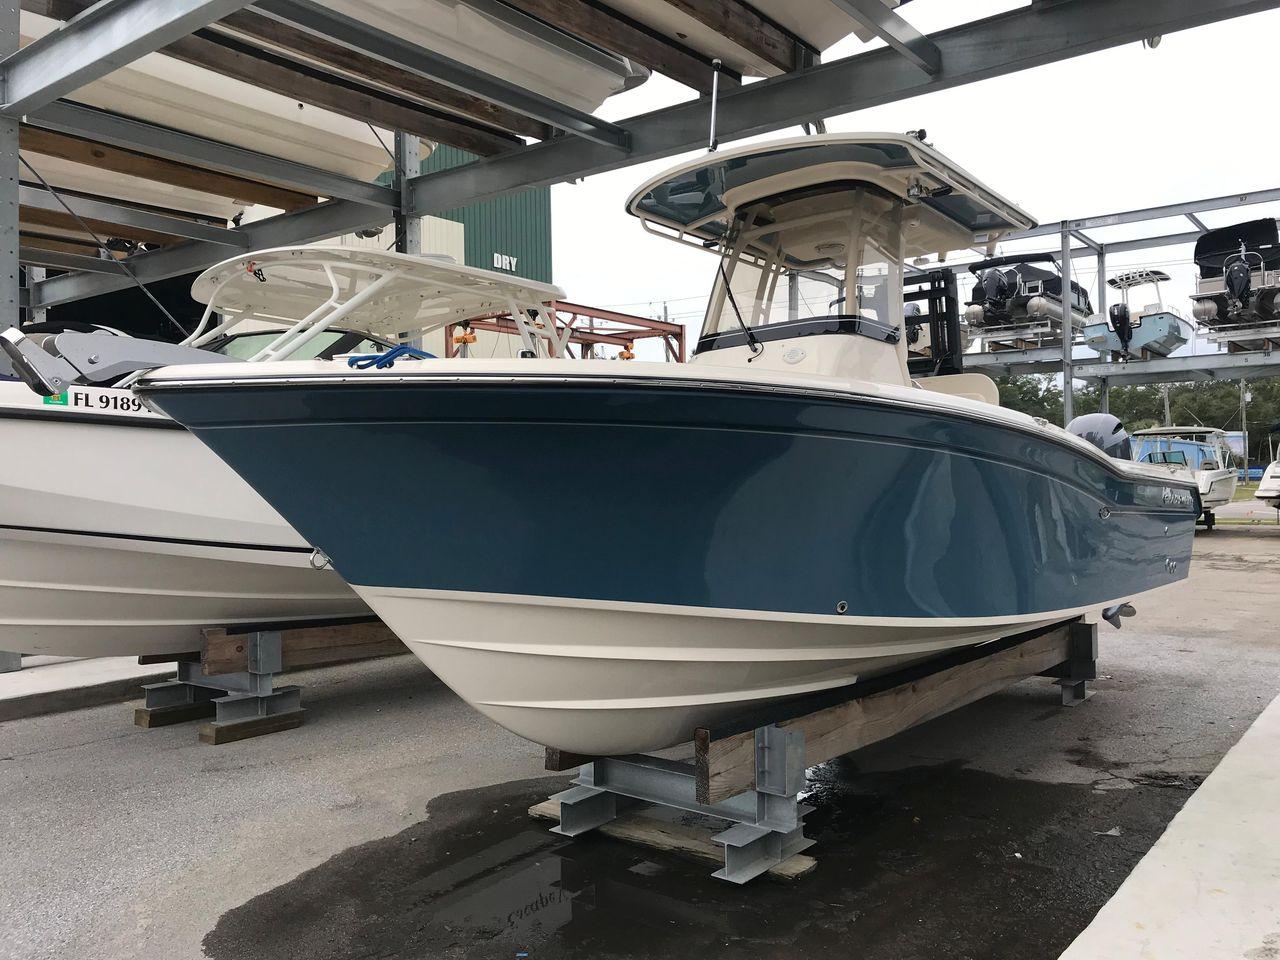 2019 New Grady-White Fisherman 257 Sports Fishing Boat For